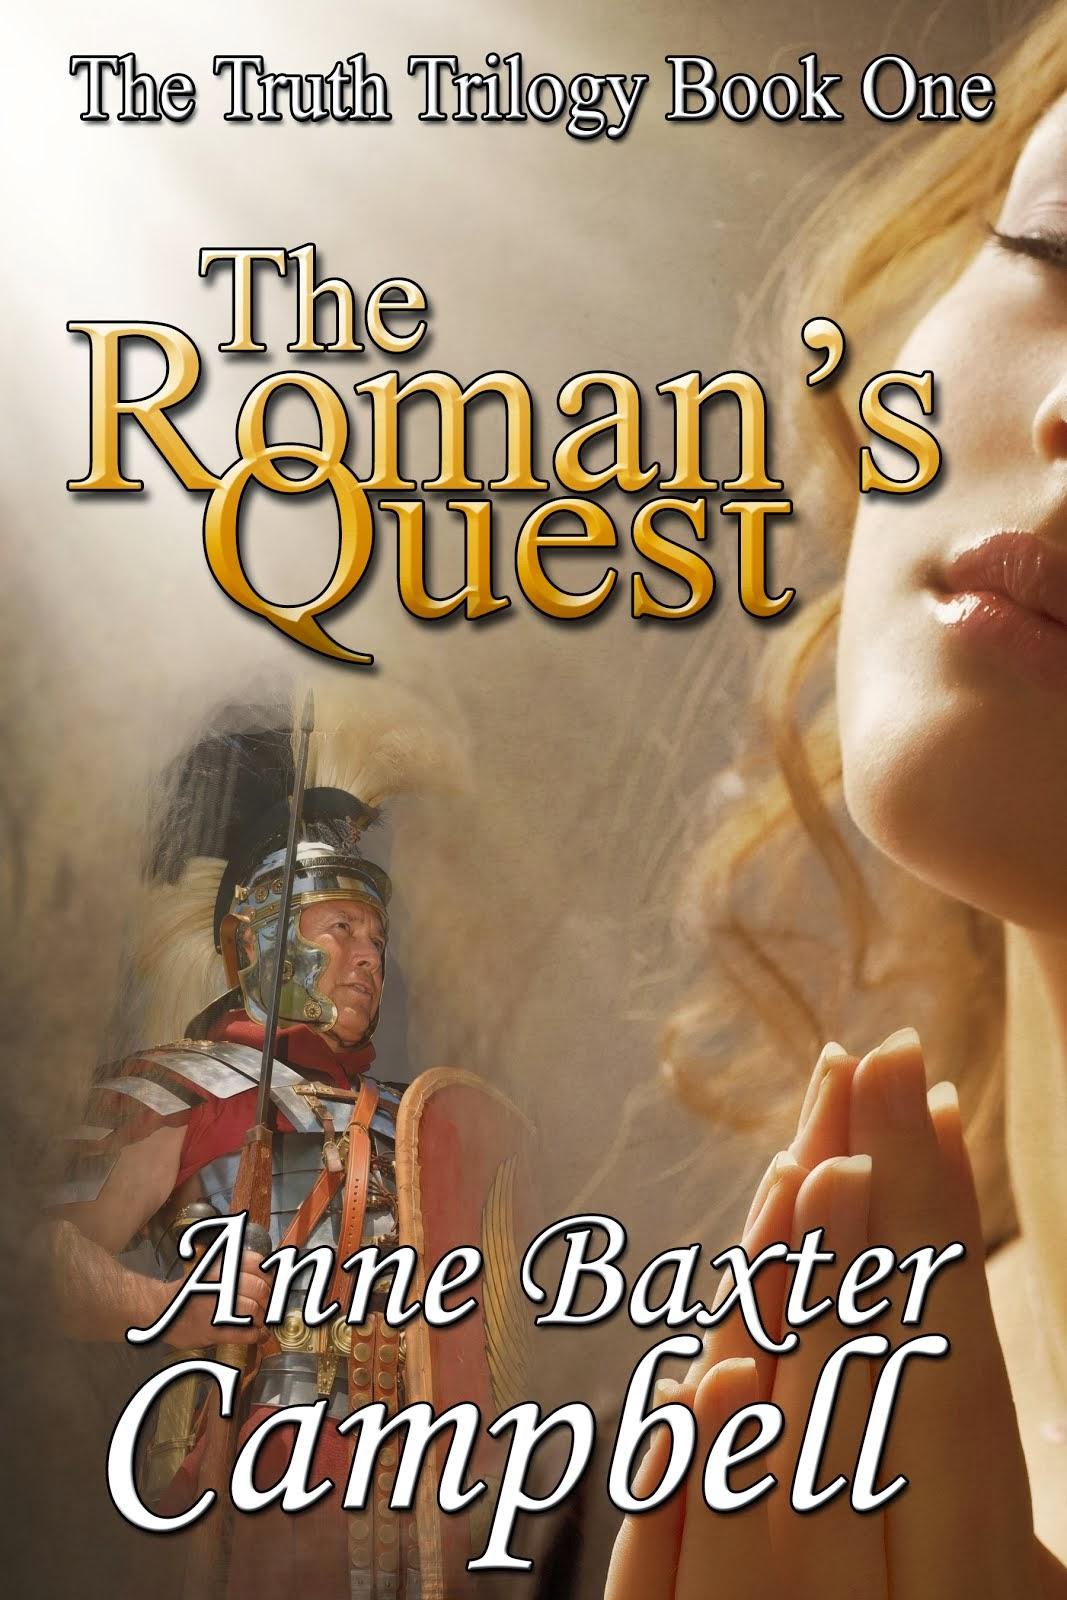 The Roman's Quest